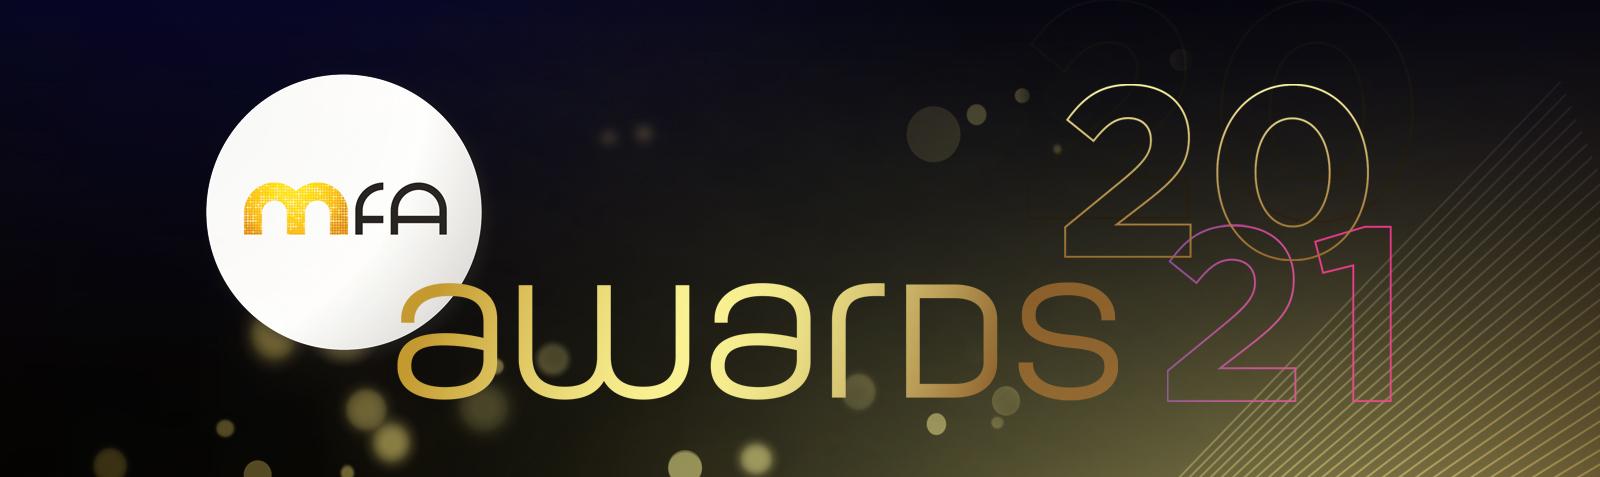 MFAEx_AwardsBanner_1600x477